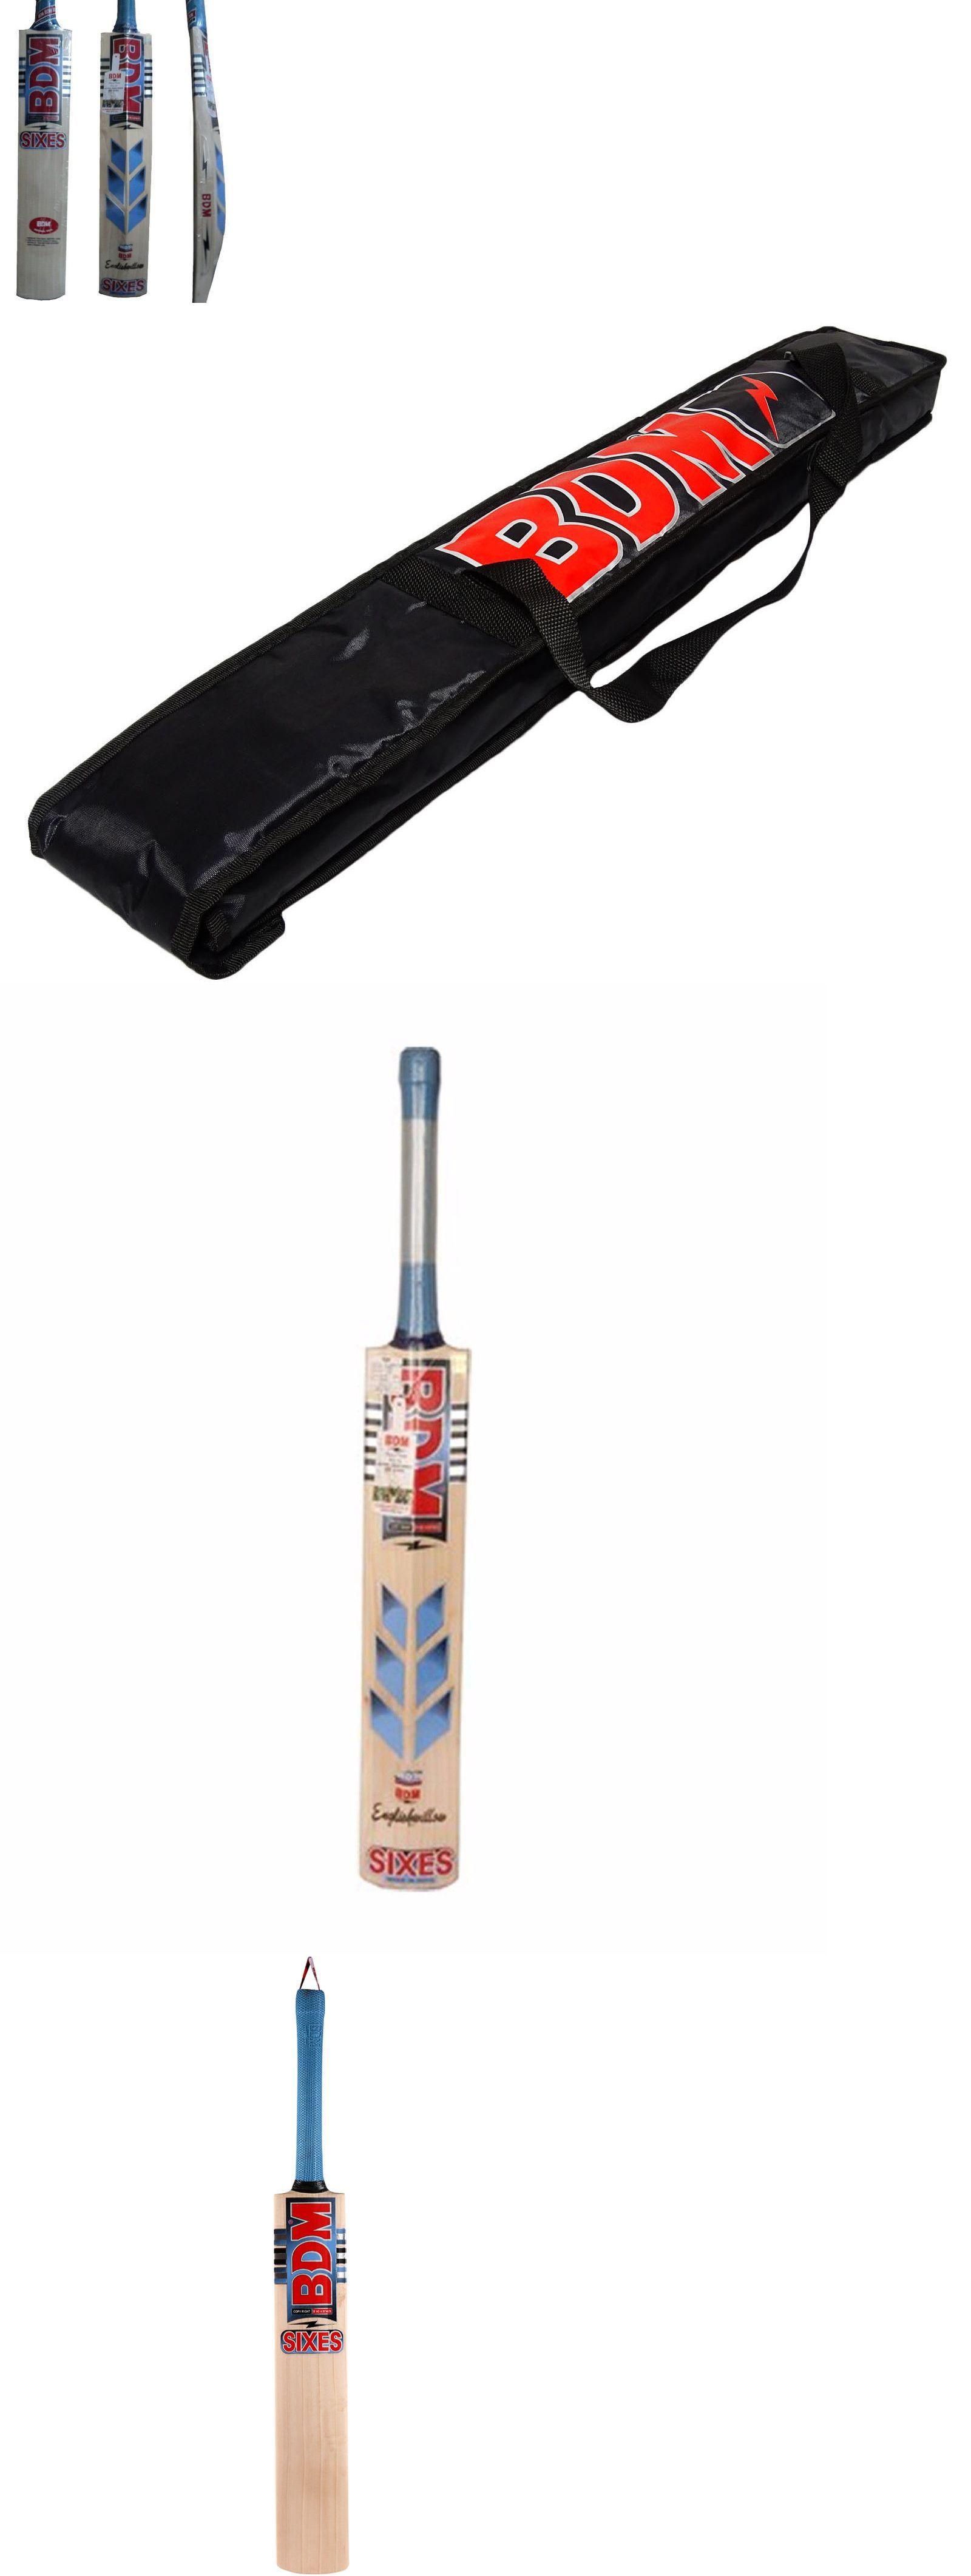 cricket 2906 english willow cricket bat bdm sixes free bat case